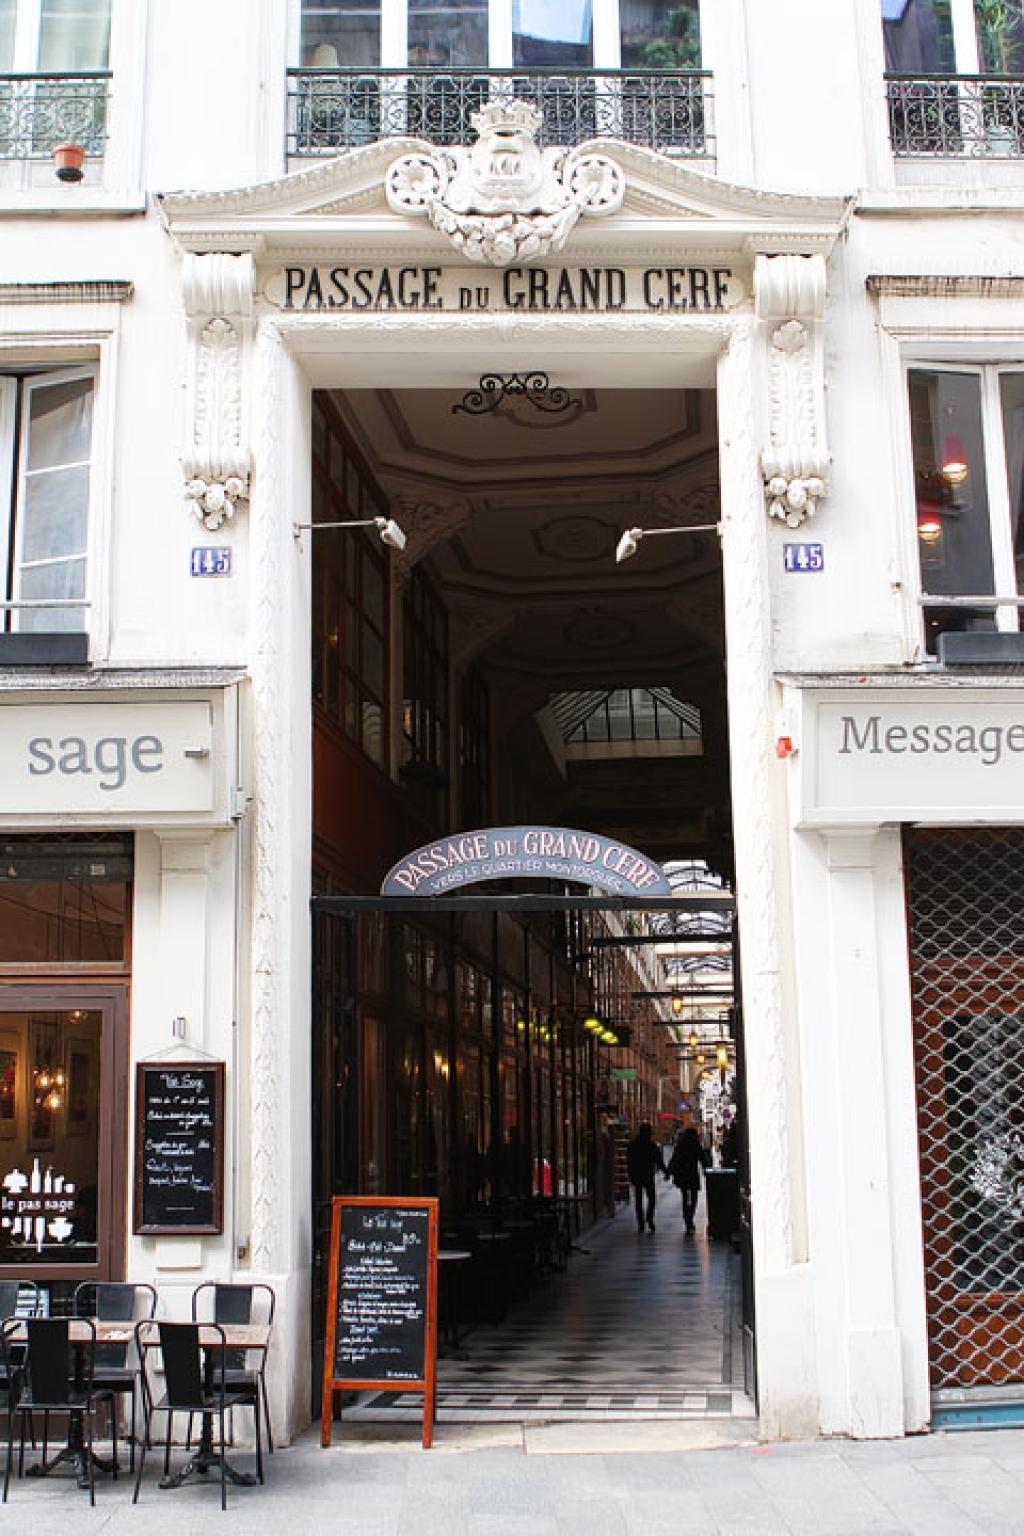 la sorbonne faaade catac nord de la. La Sorbonne Faaade Catac Nord De La. A